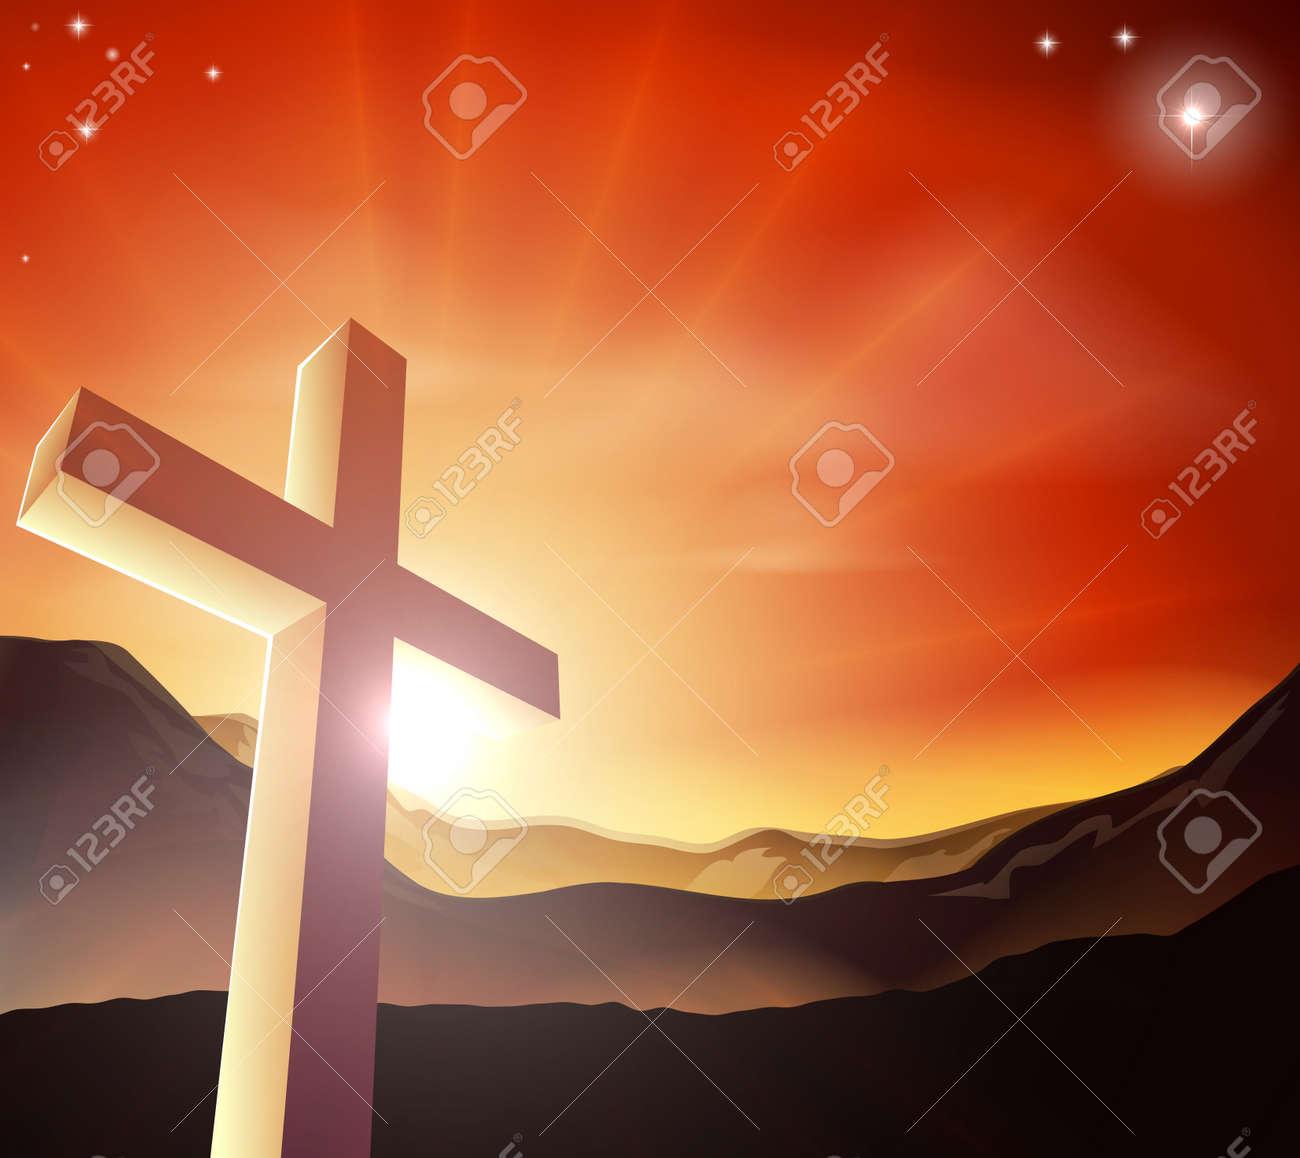 sun rising behind the cross over a mountain range resurrection